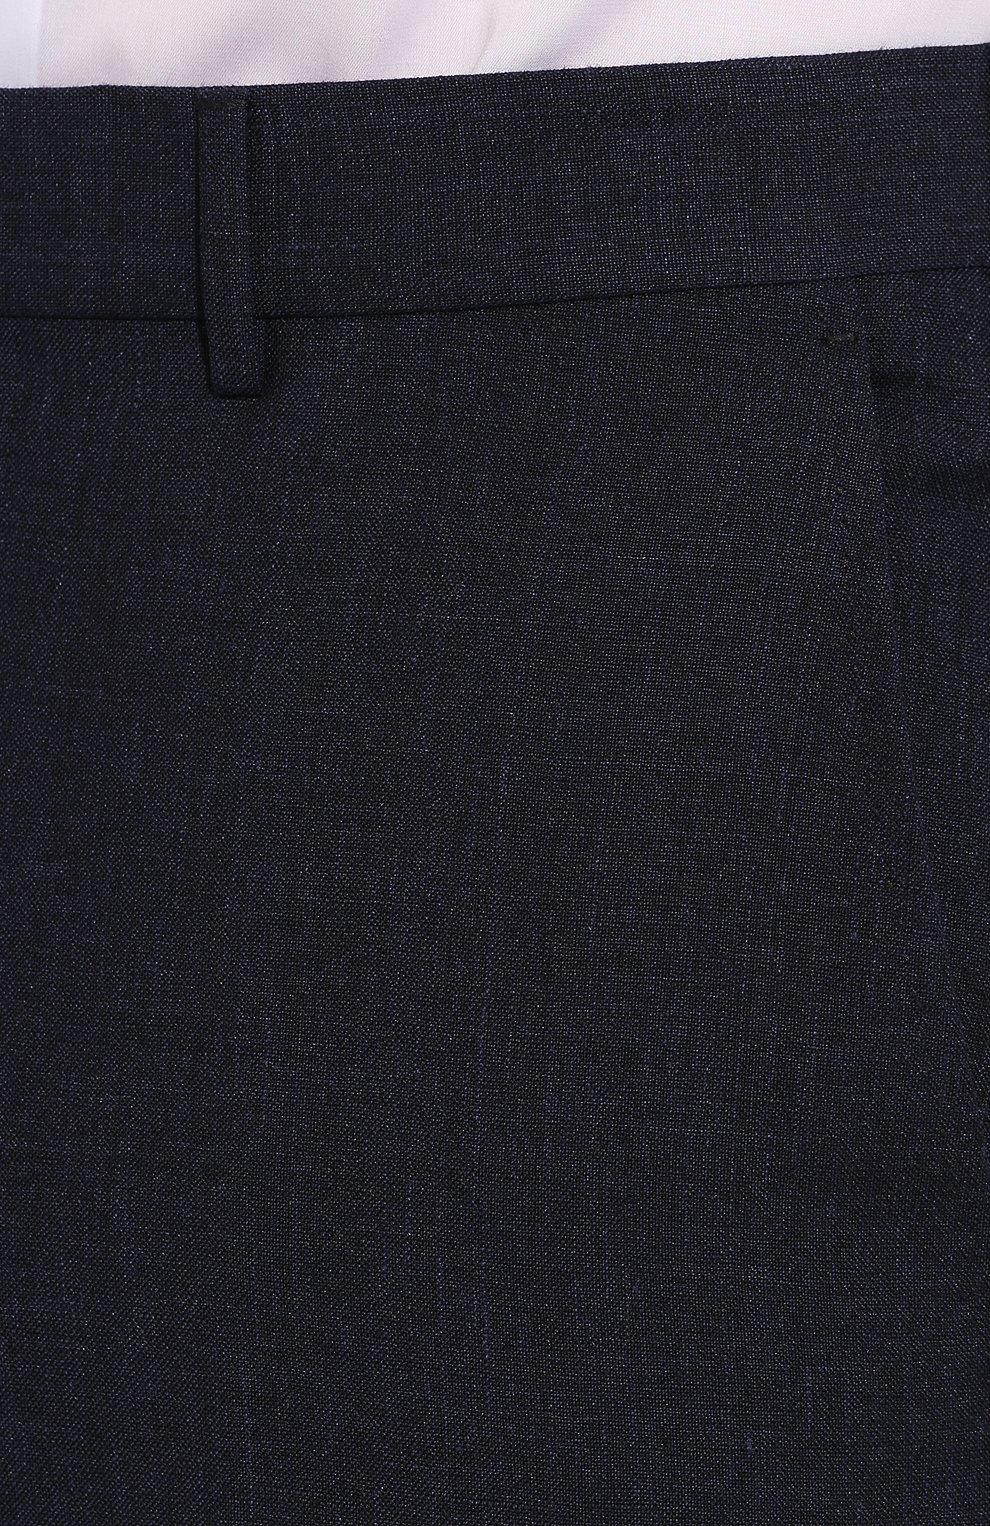 Мужские брюки из смеси льна и шерсти ERMENEGILDO ZEGNA темно-синего цвета, арт. 770F04/75TB12   Фото 5